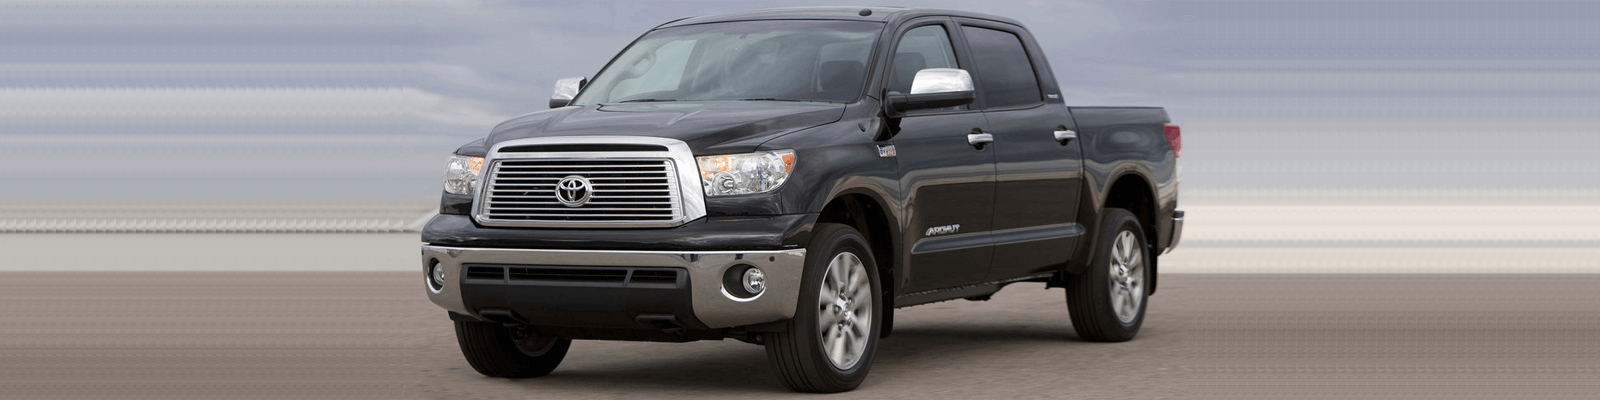 Elite Auto Wholesale Richmond VA Where Integrity Says It All